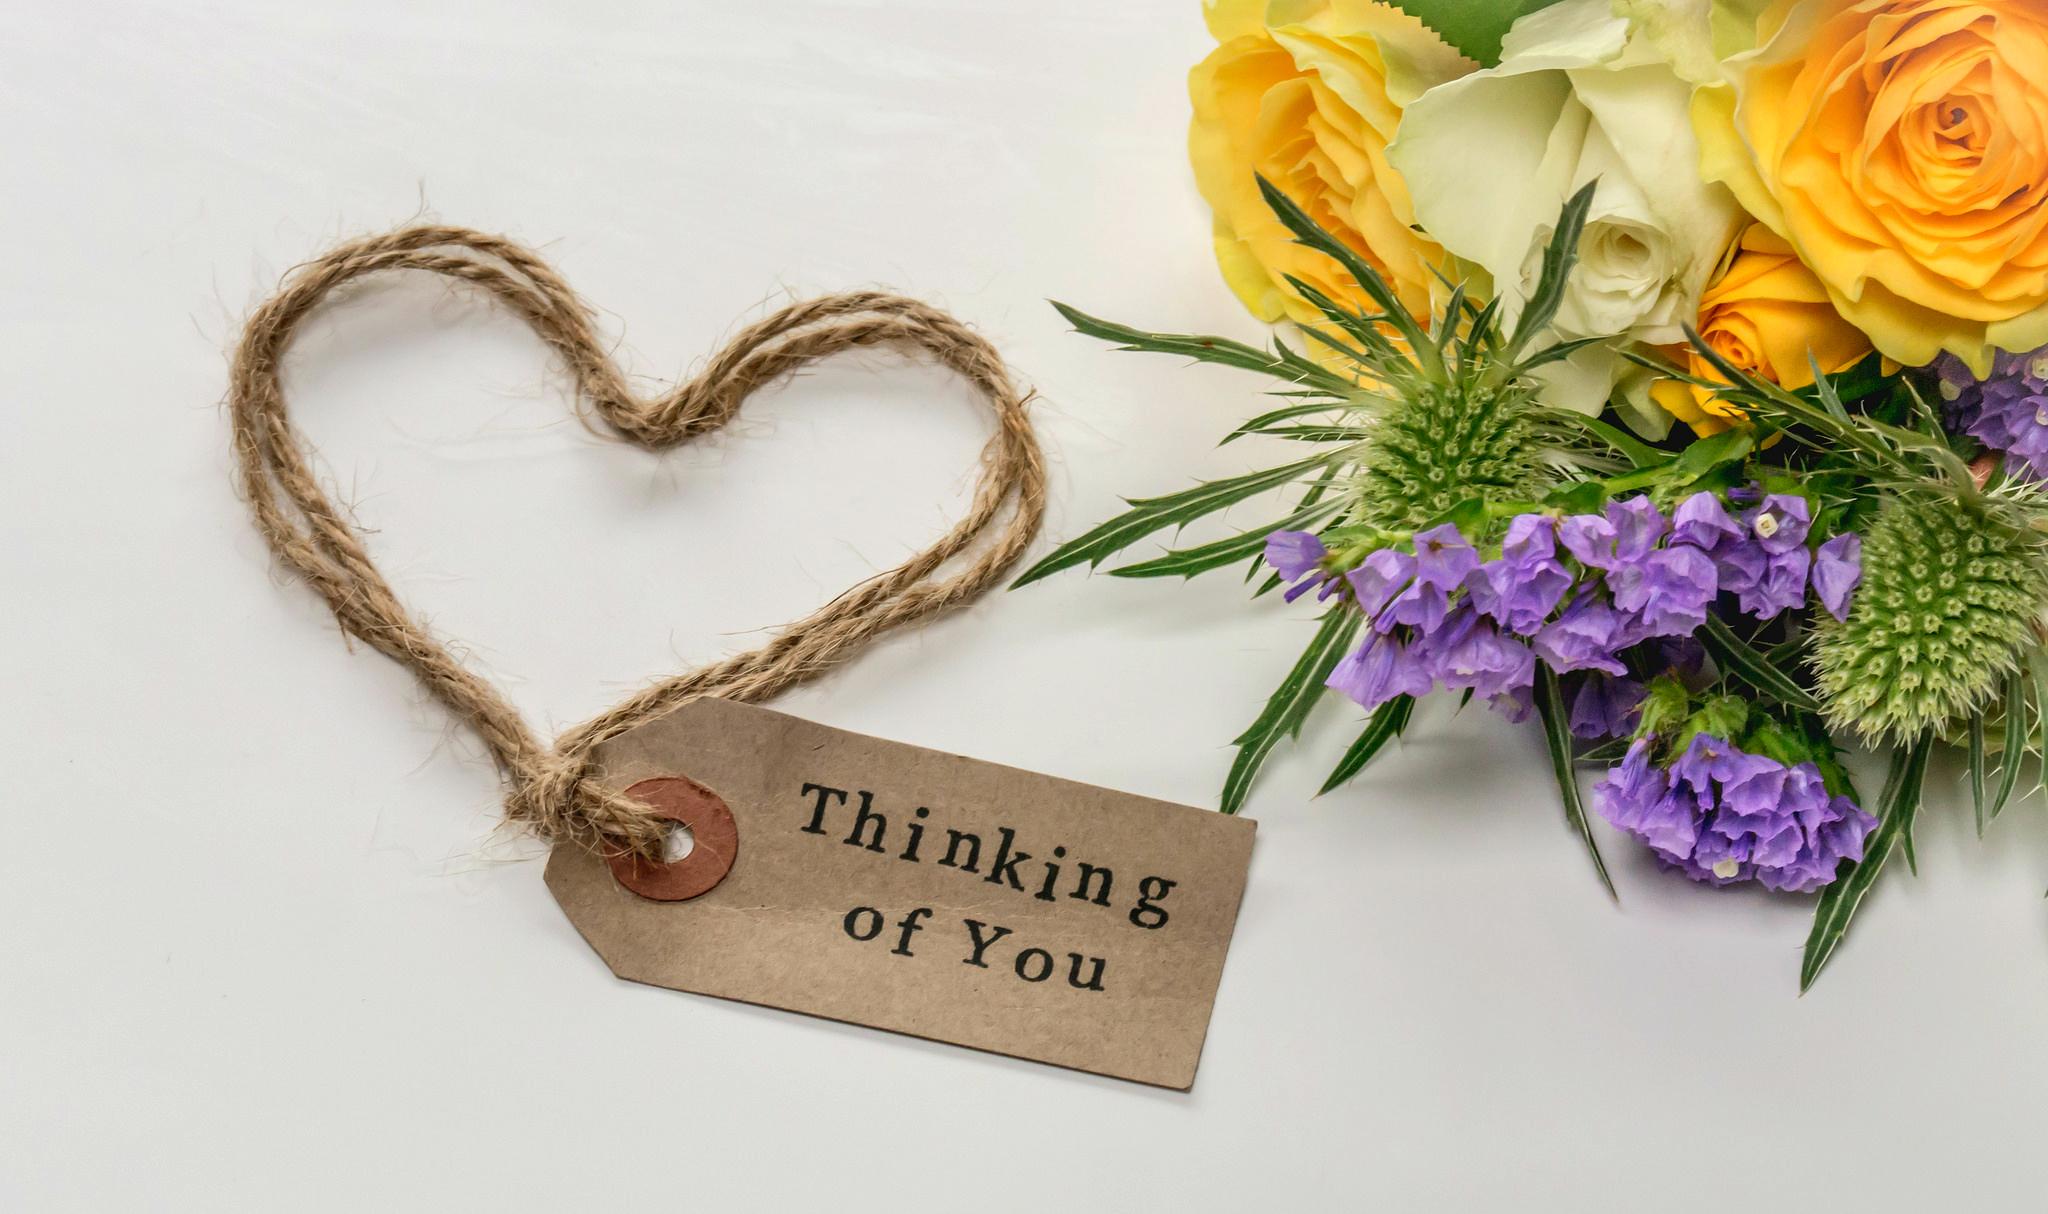 Цветок в подарок картинки с надписями, картинки